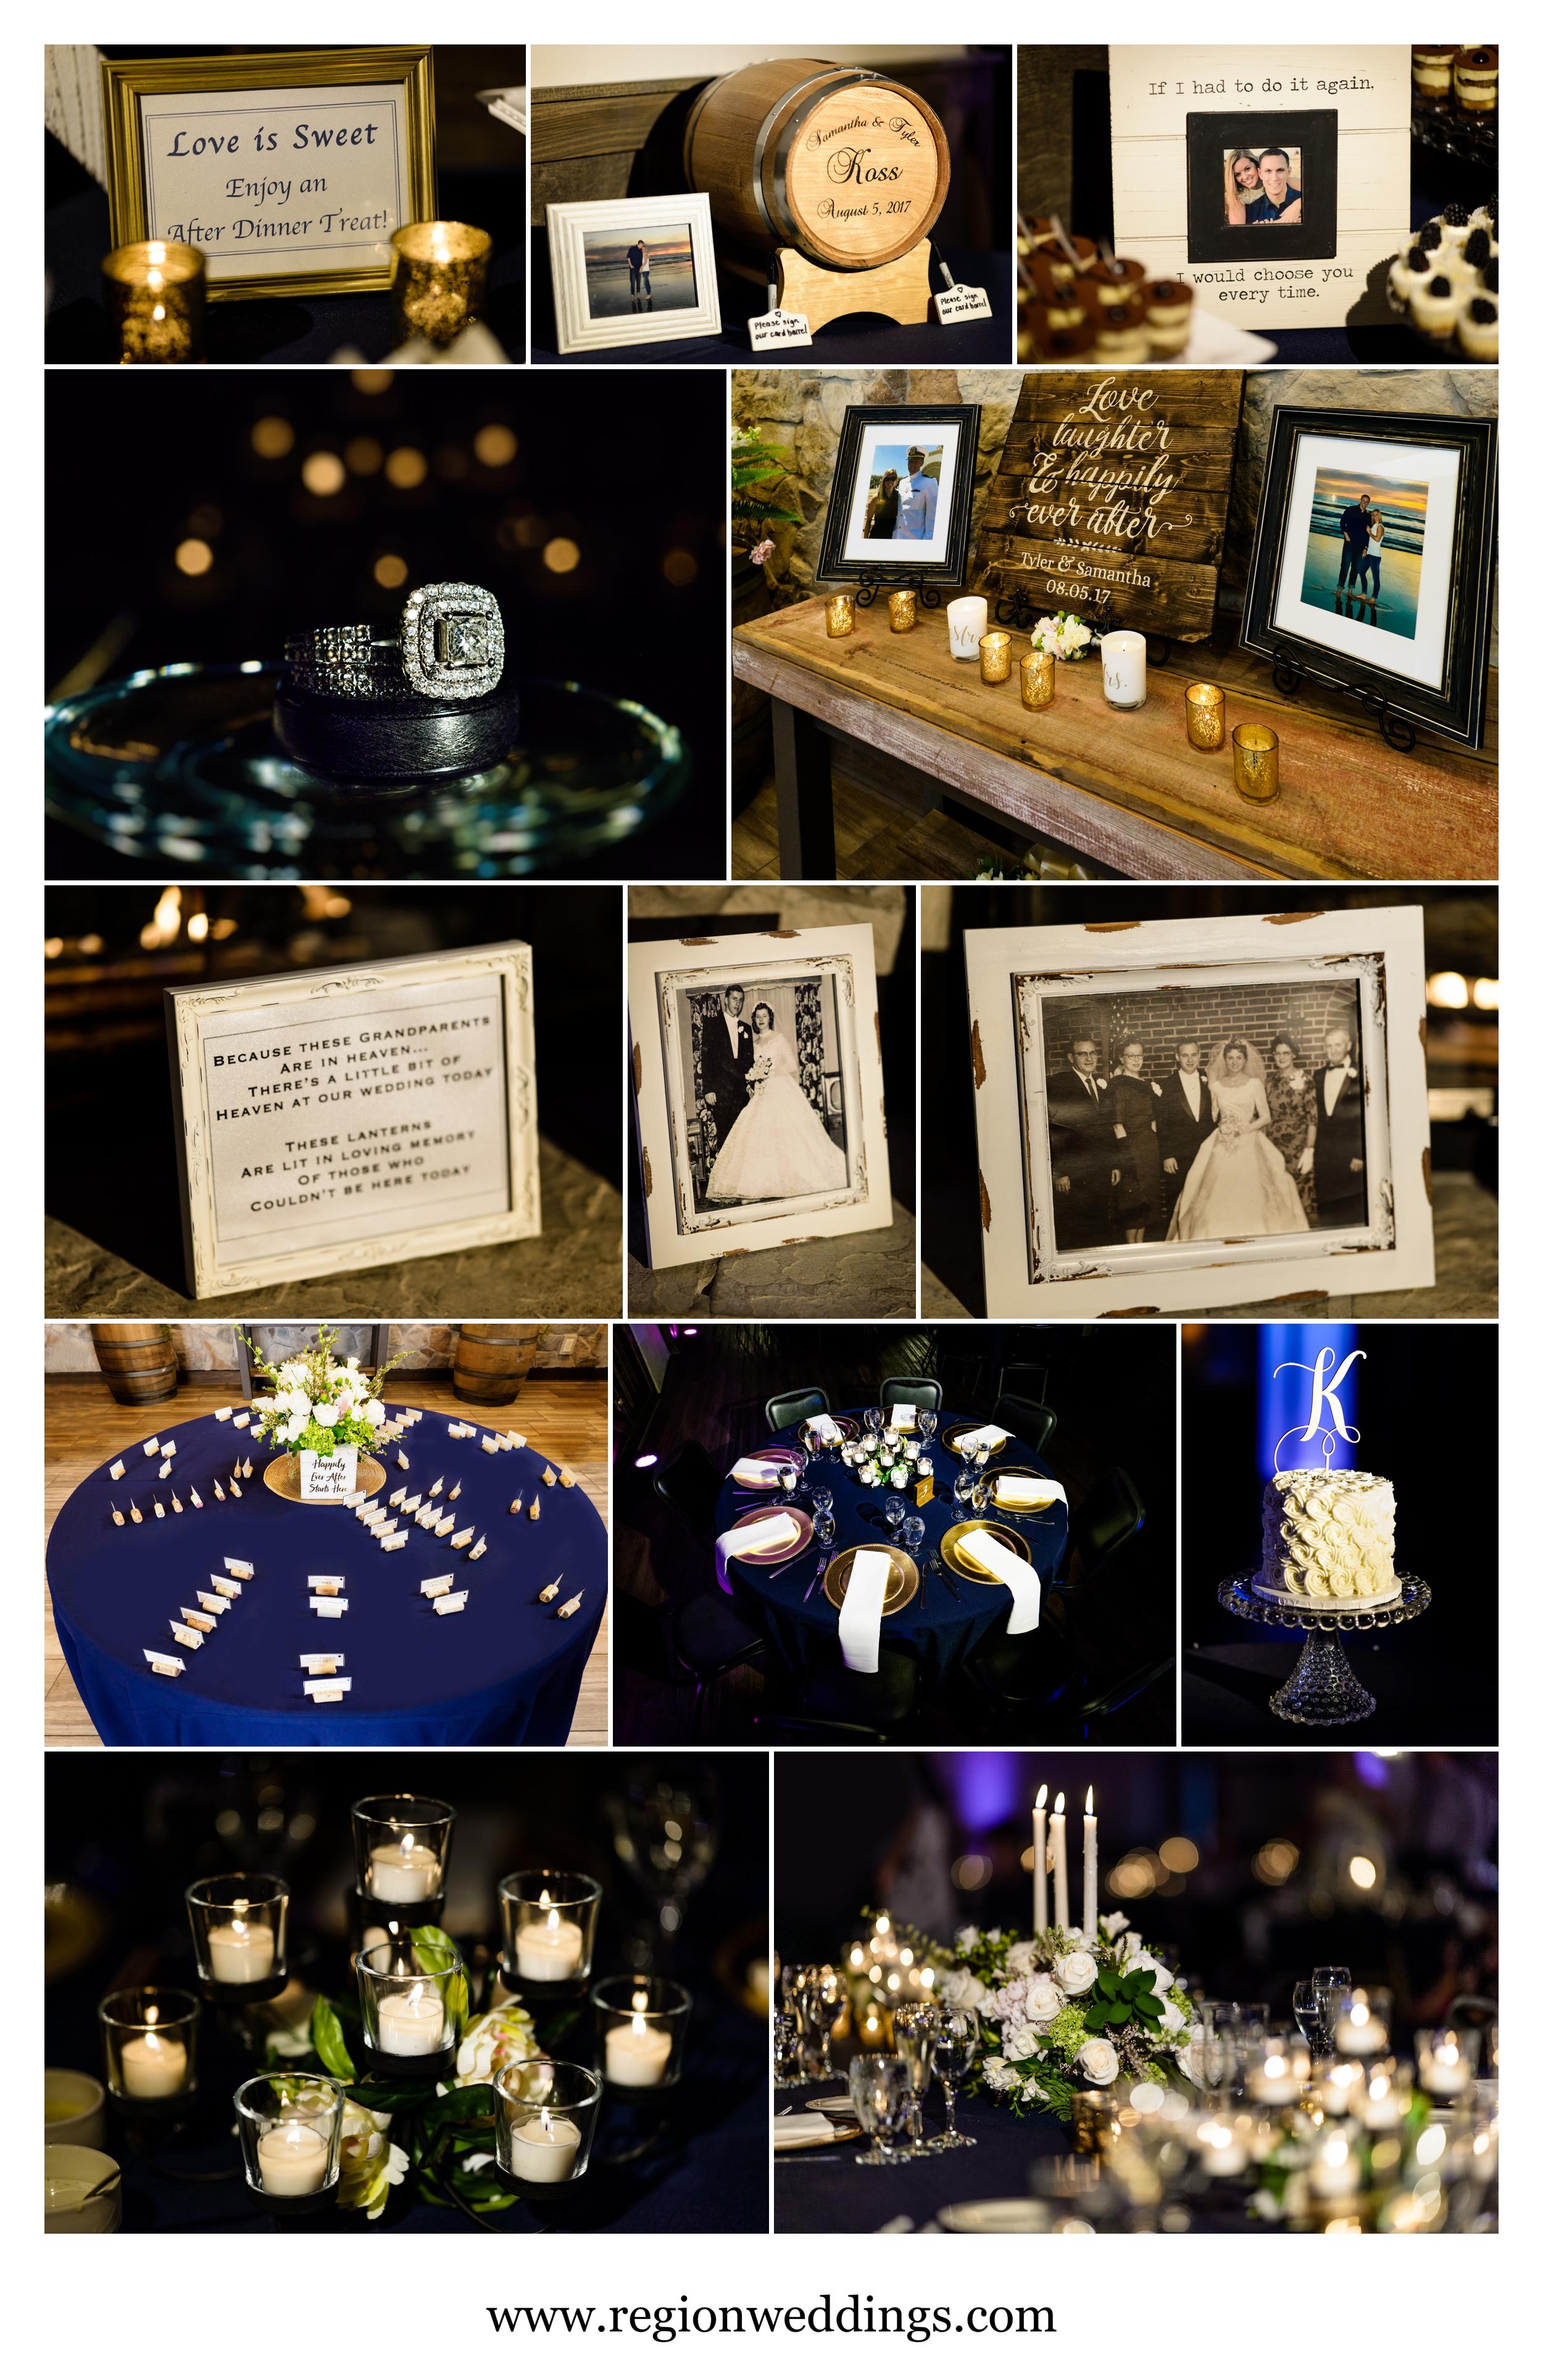 Wedding decorations at The Market in Valparaiso, Indiana.